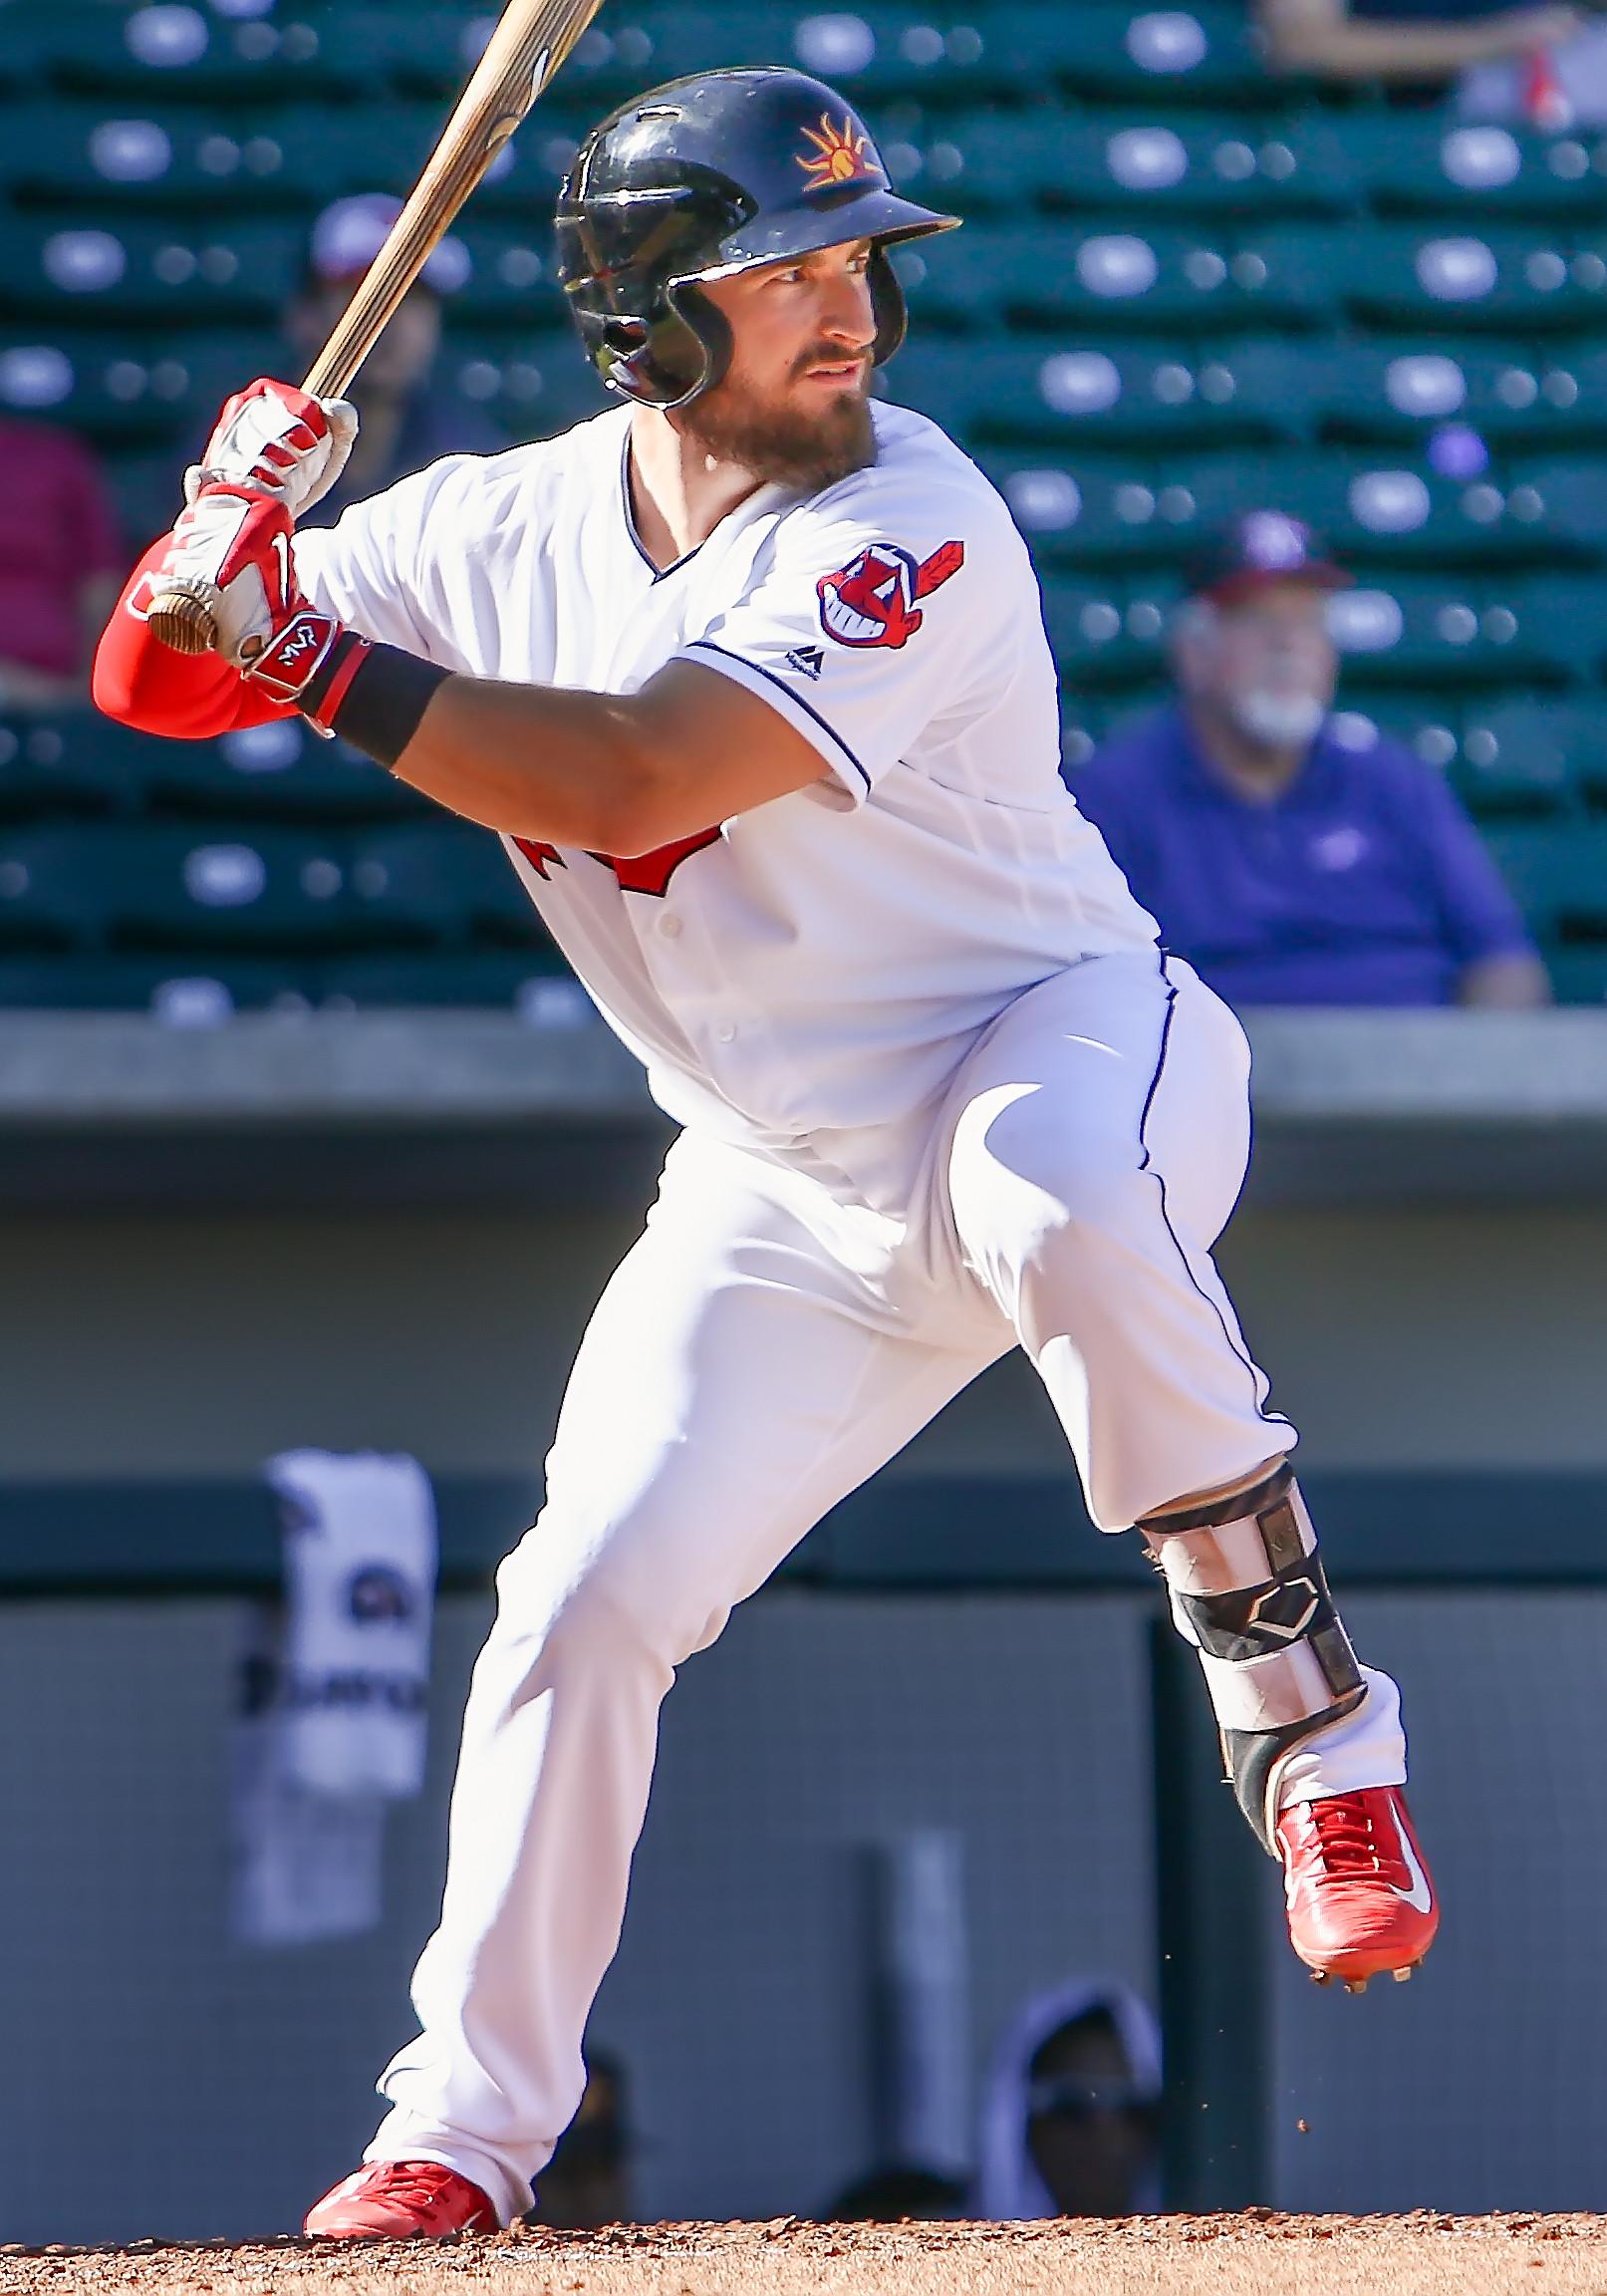 MiLB: NOV 11 Arizona Fall League - Surprise Saguaros v Mesa Solar Sox